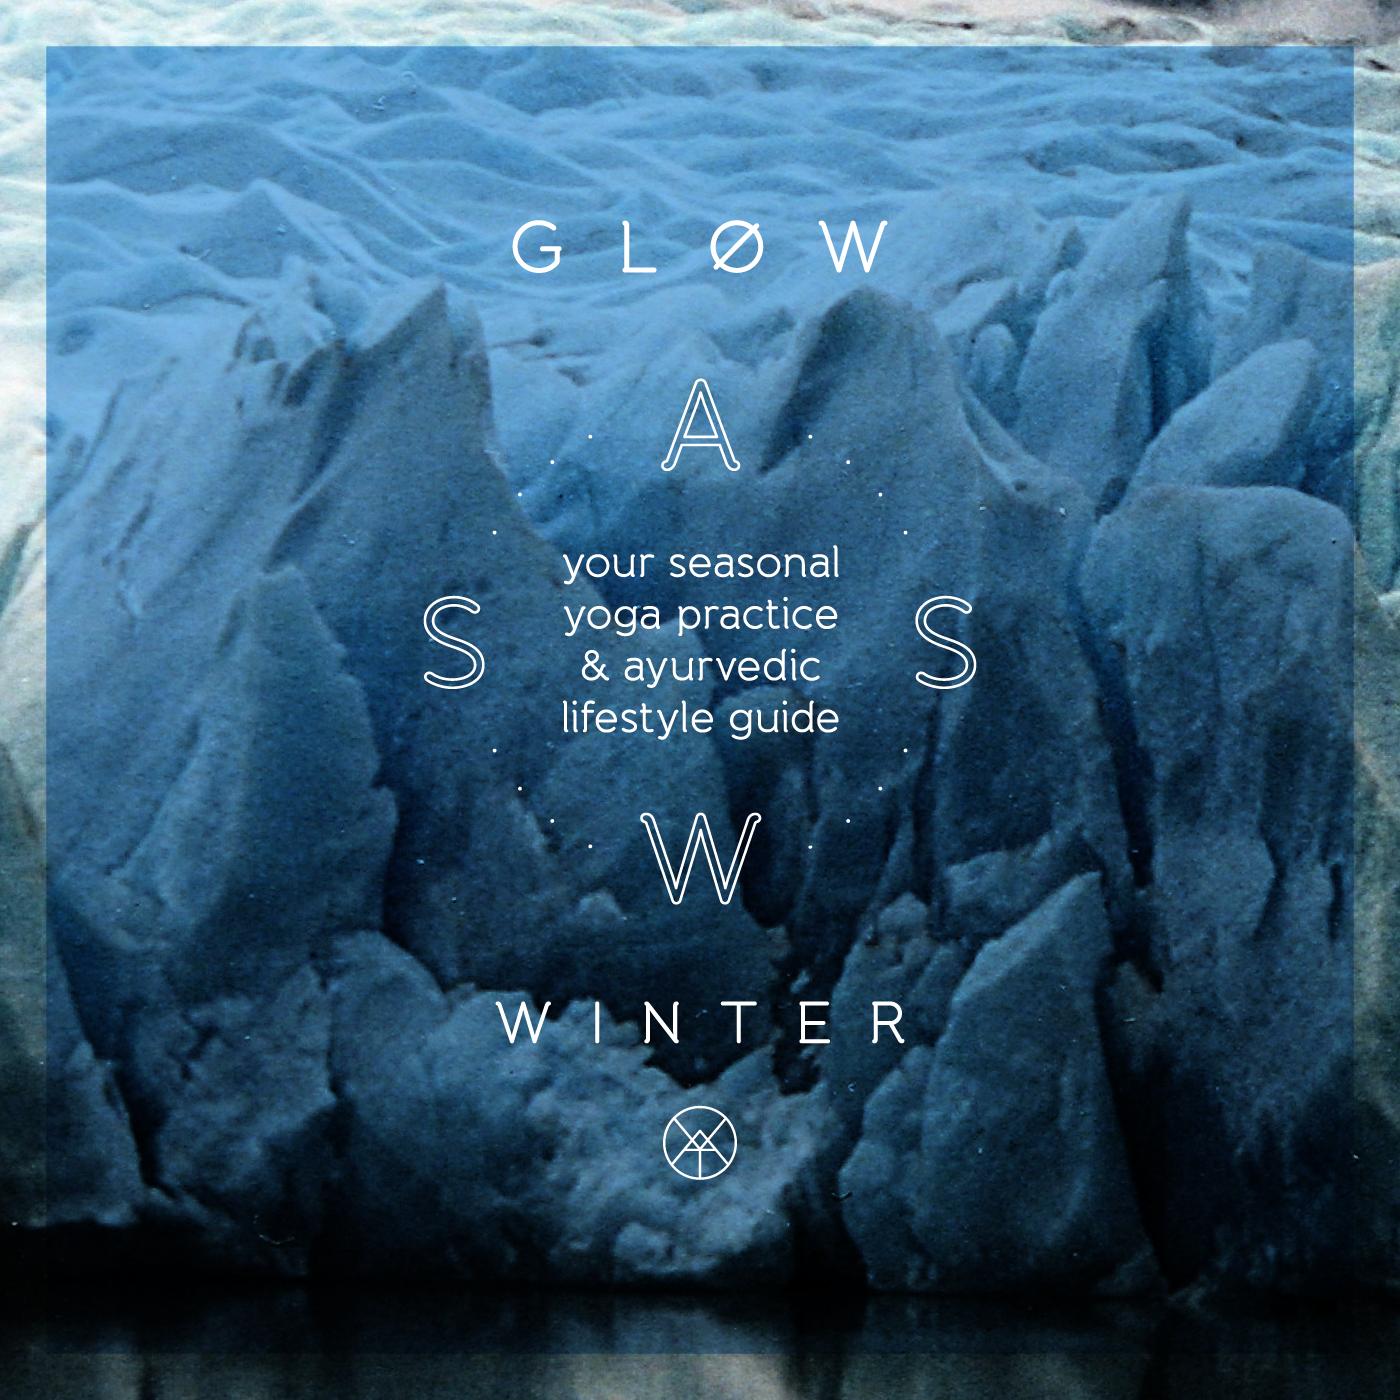 GLOW-SEASONS-WINTER.png